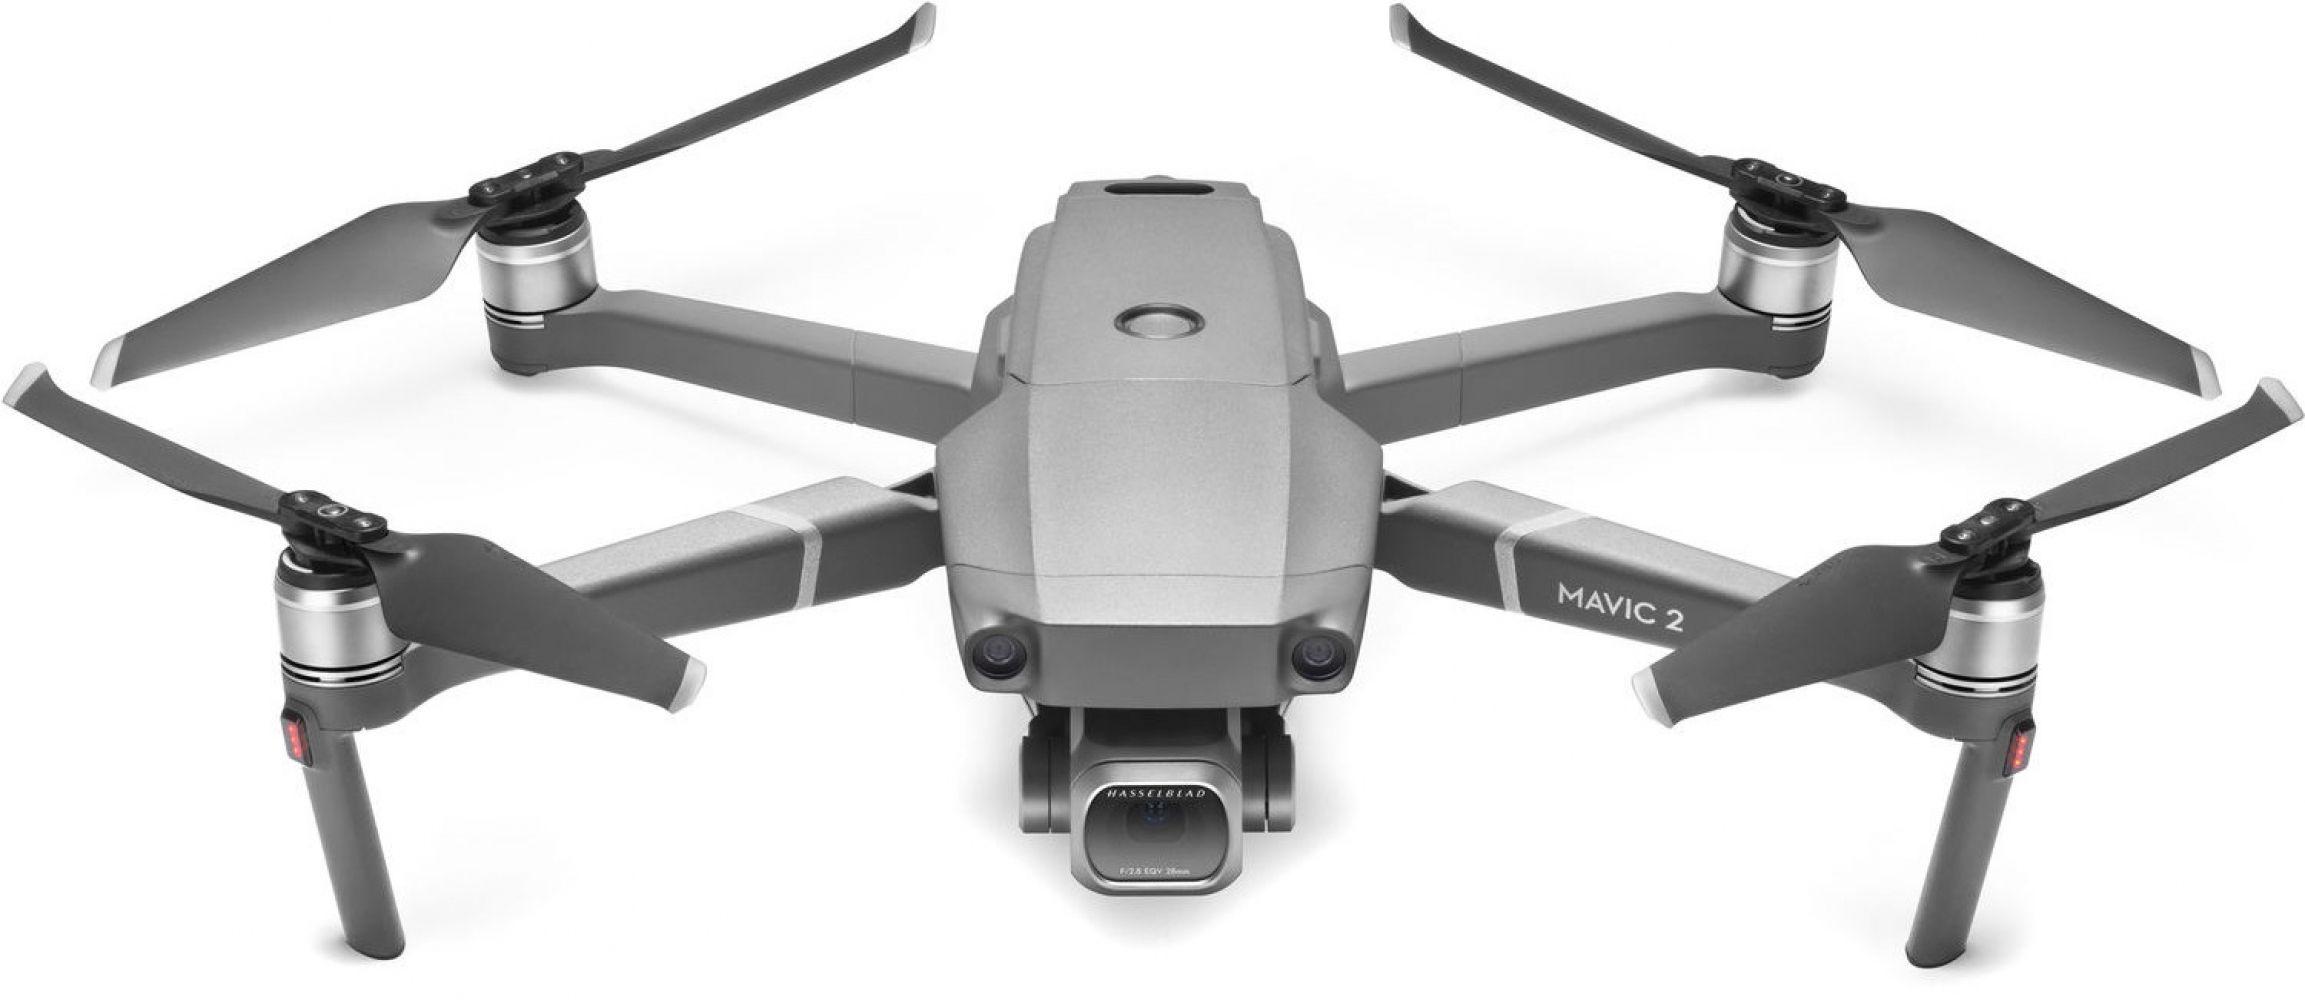 Купить Квадрокоптеры, Квадрокоптер DJI Mavic 2 Pro (CP.MA.00000013.01)